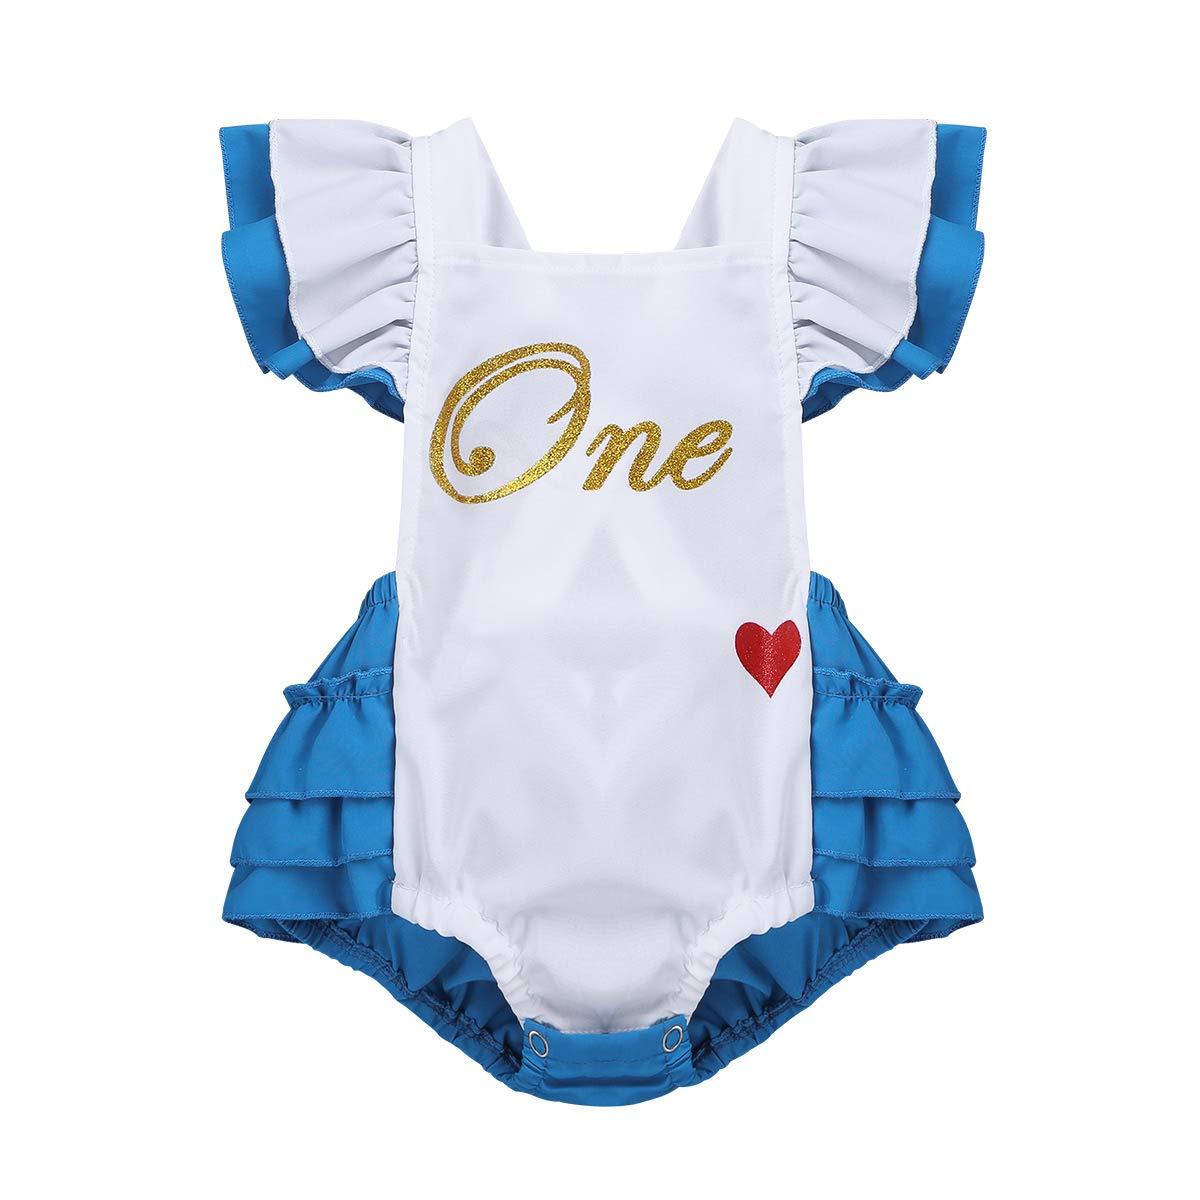 IEFIEL Disfraz de Princesa Niña Bebé Vestido Costume Pelele ...